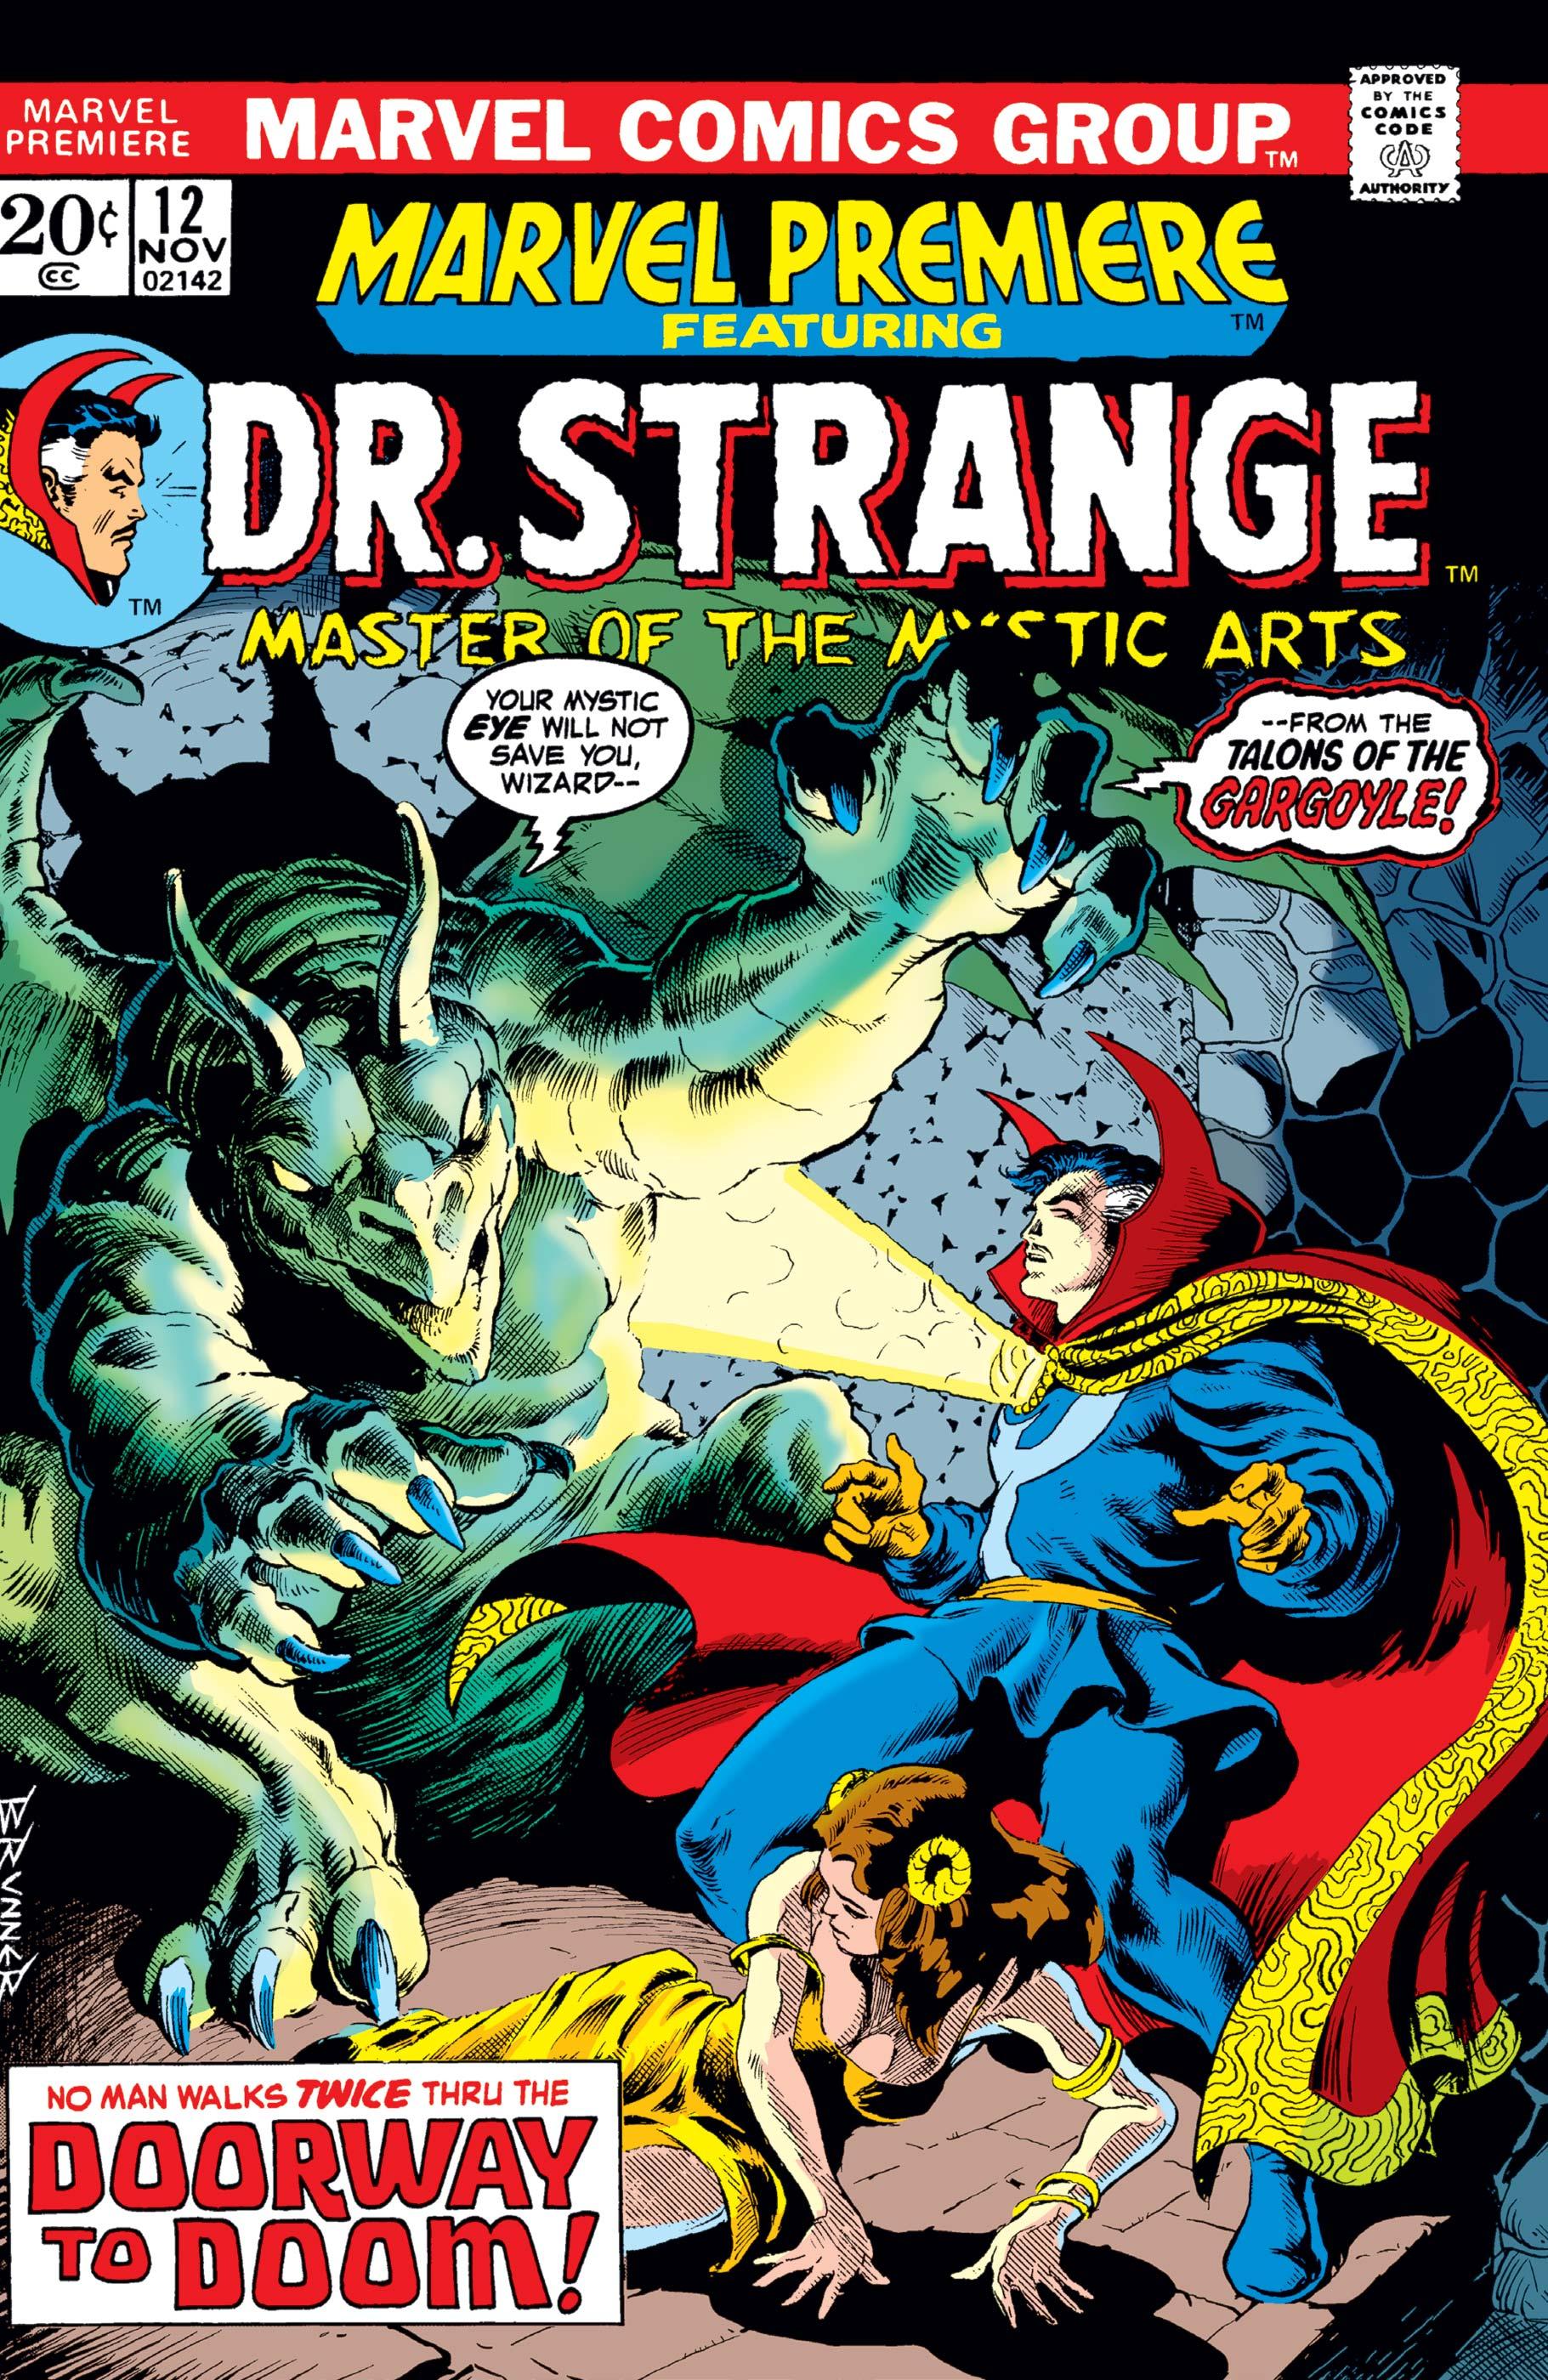 Marvel Premiere (1972) #12